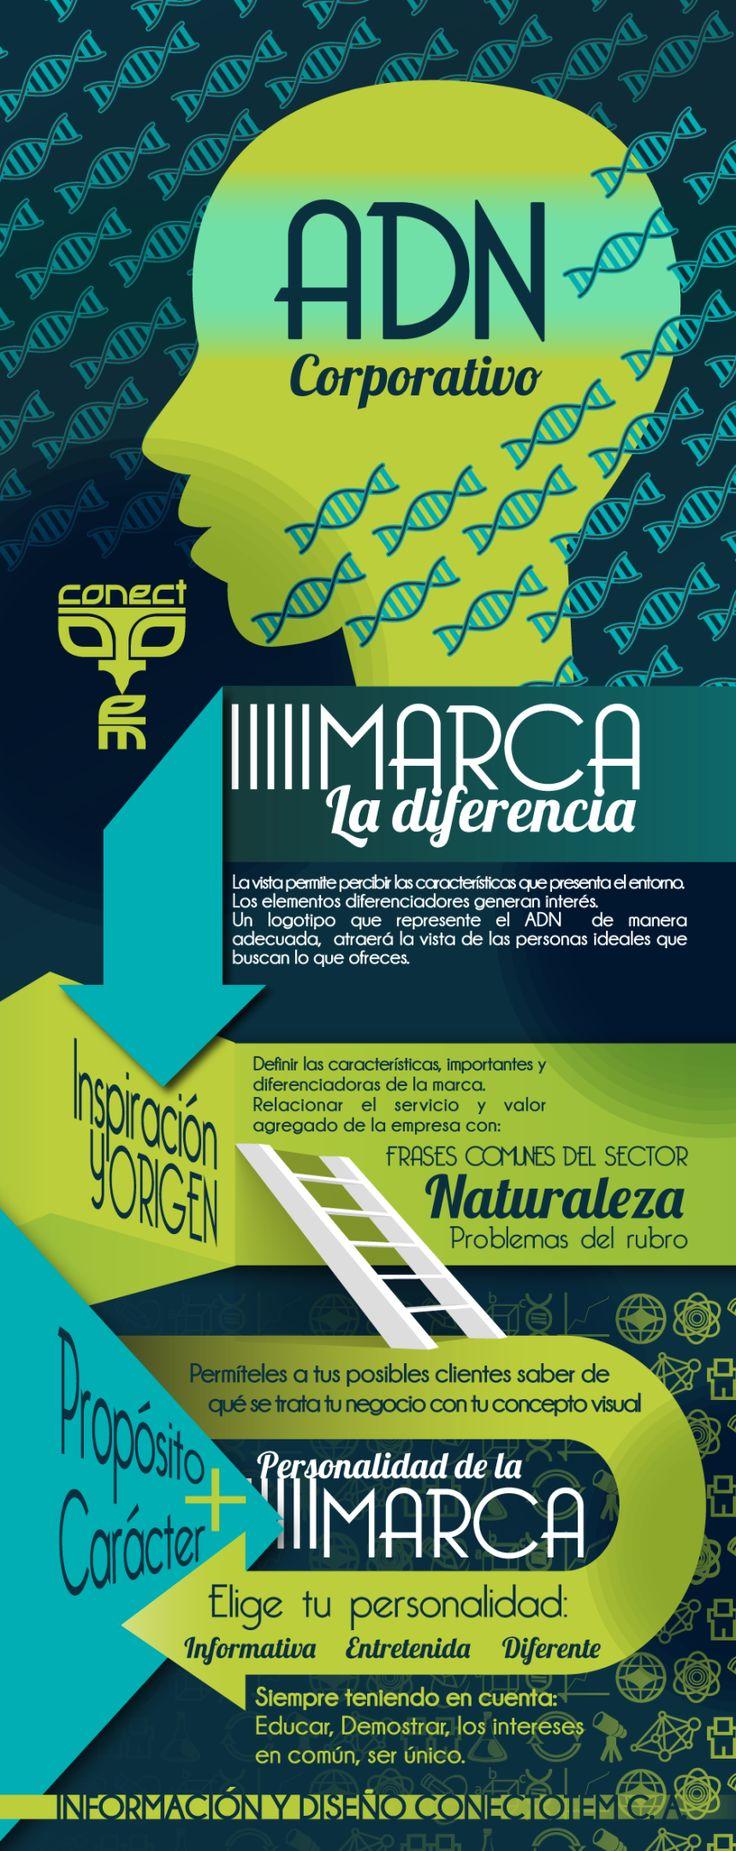 ADN corporativo #Marca la diferencia #branding cc @anlsm30